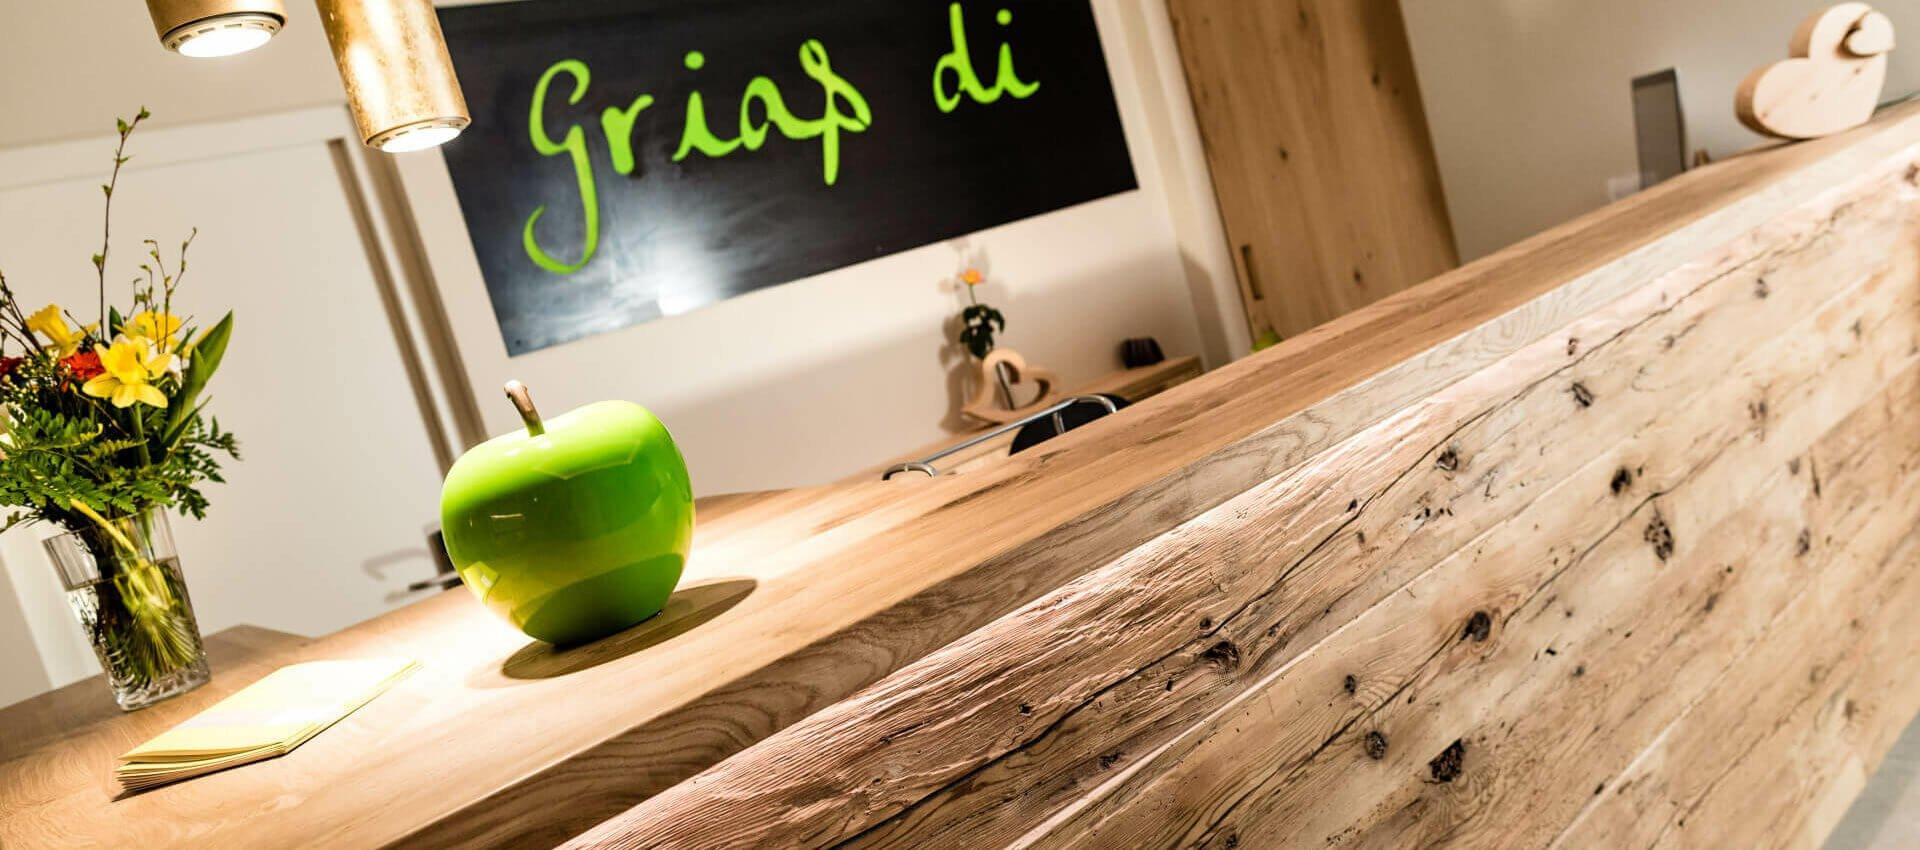 Rezeption 4 Sterne Hotel bei Meran Pfeiss - Lana - Südtirol